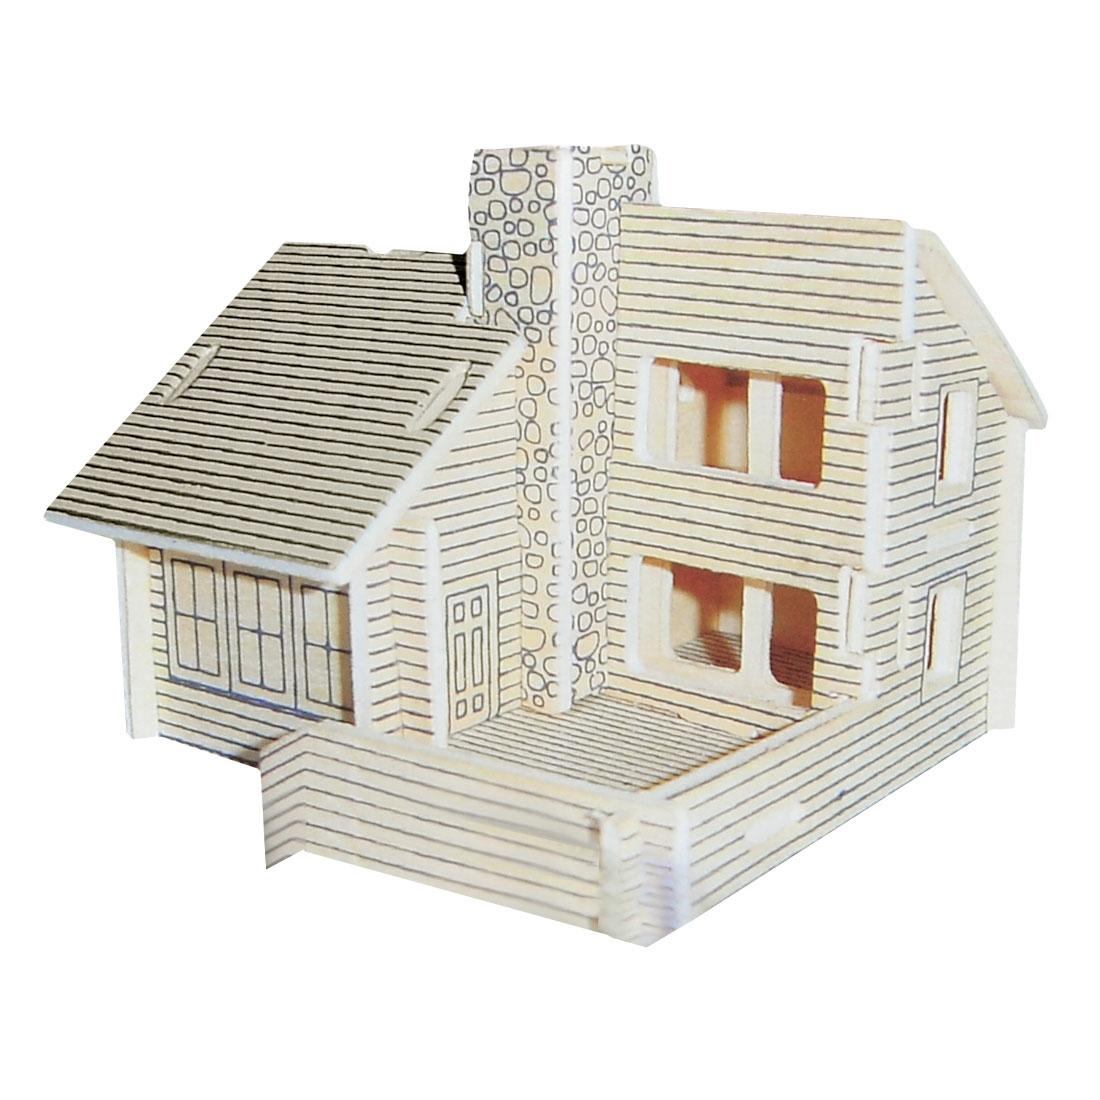 Child 3D Wood Villa Model Woodcraft Construction Kit Puzzle Toy